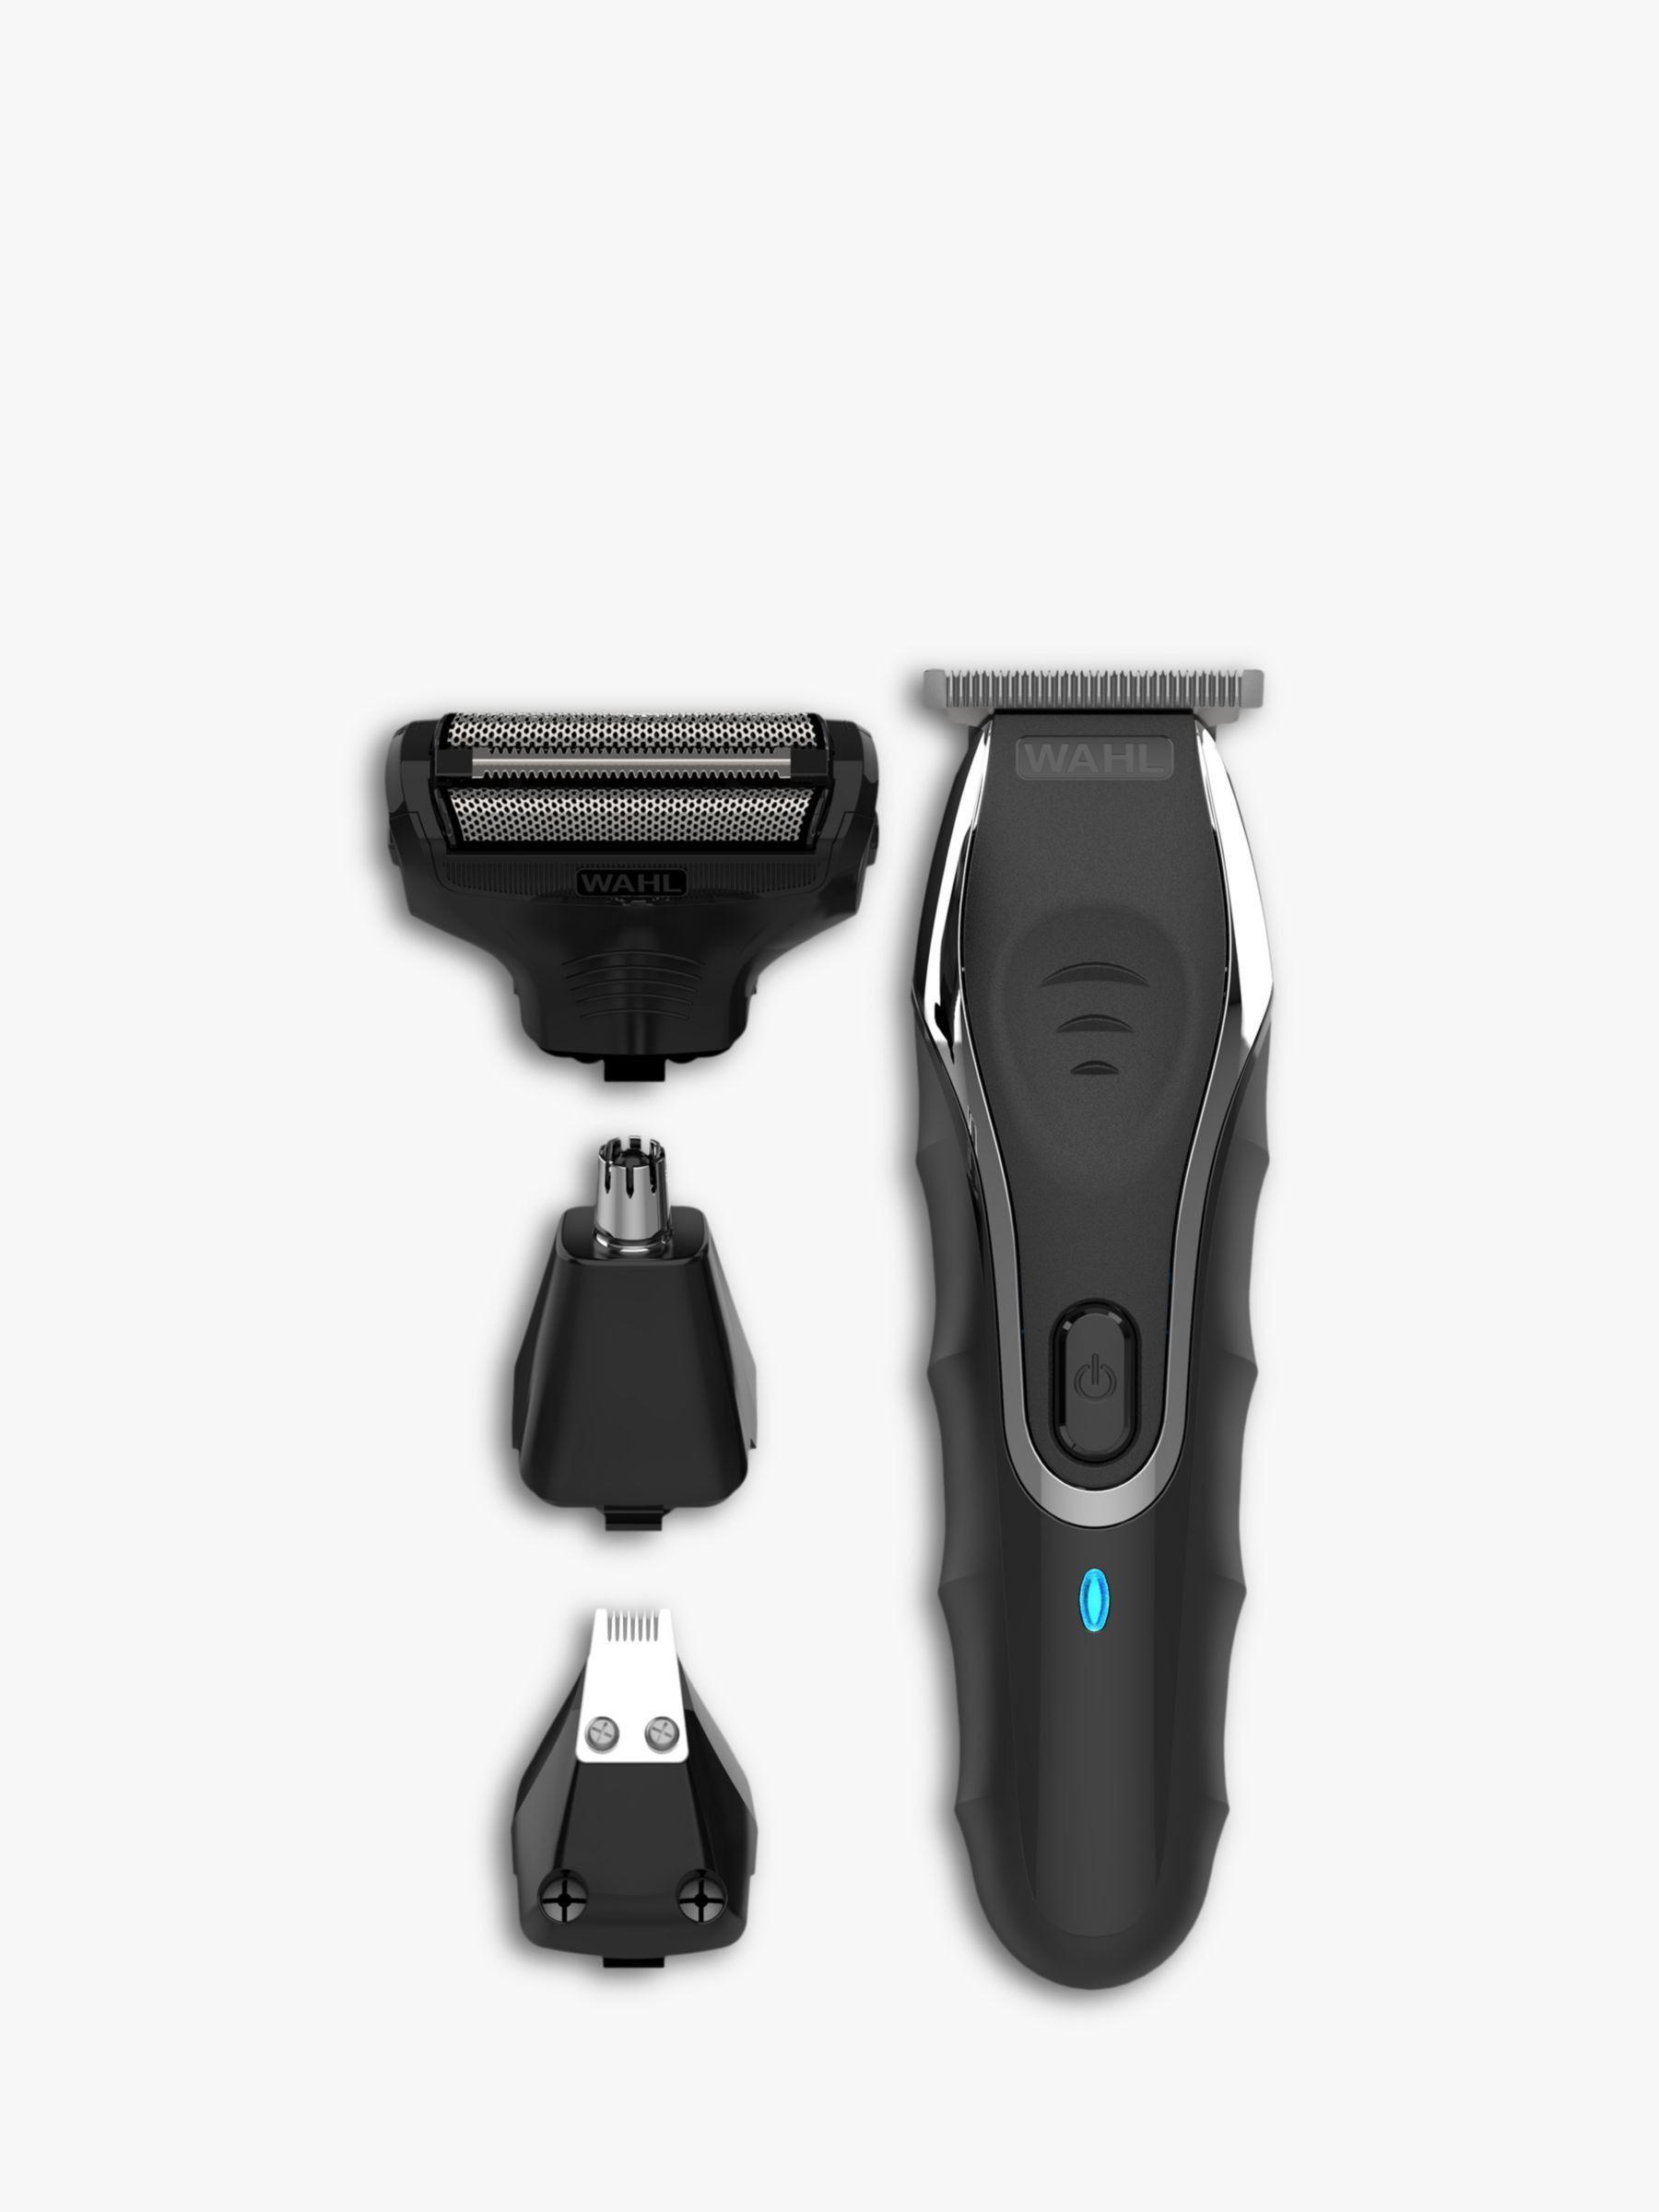 Wahl Lithium Ion Multi Groomer Men S Beard Facial Total Body Groomer 9888 600 Body Groomer Beard Trimming Groomer